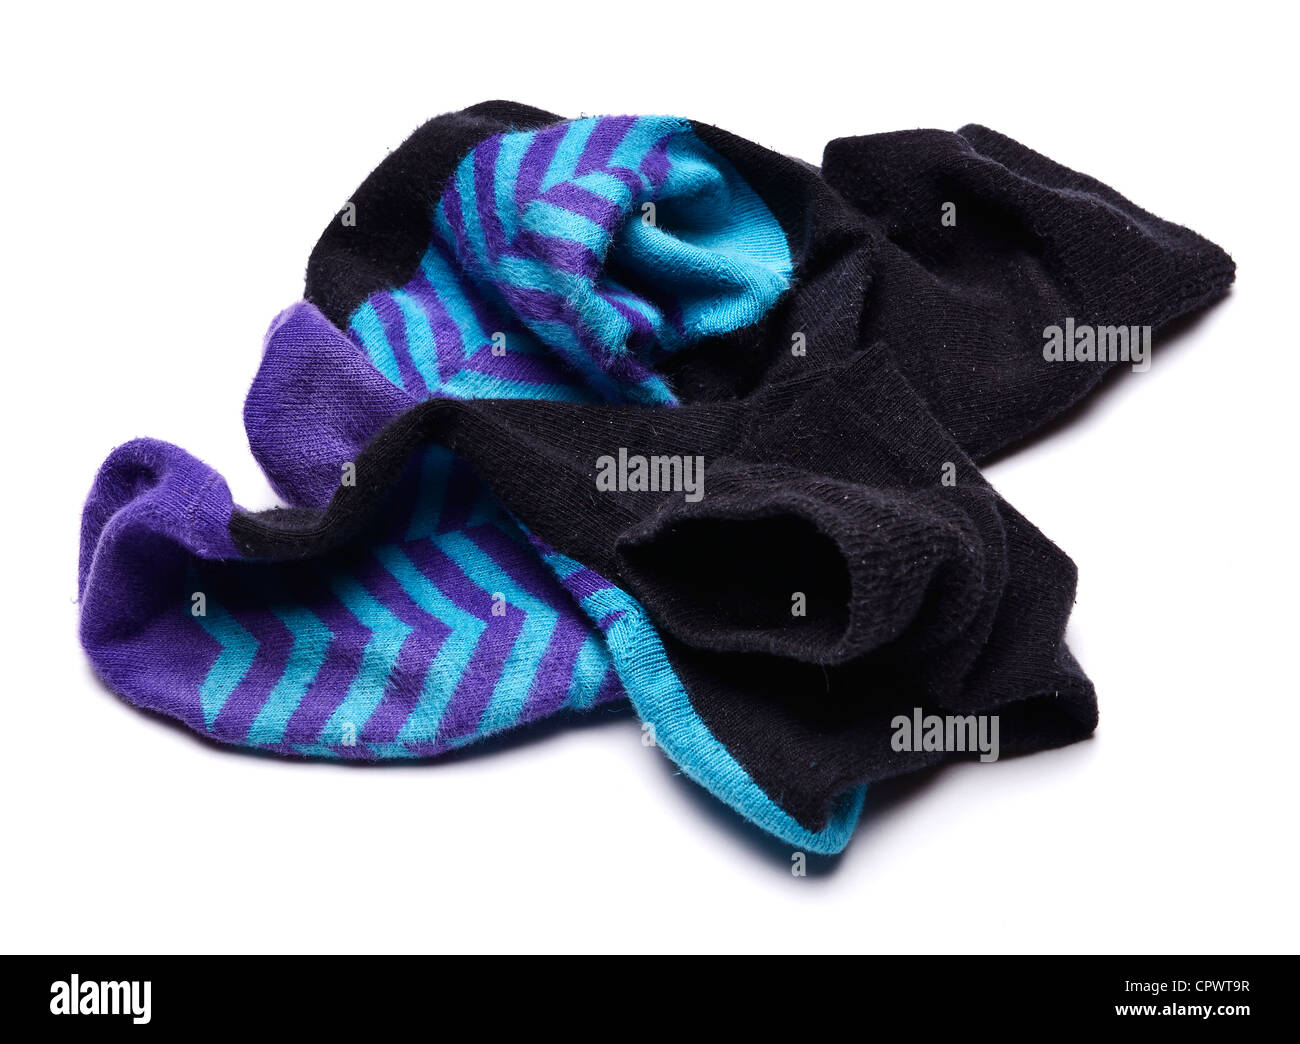 Calcetines sucios Imagen De Stock